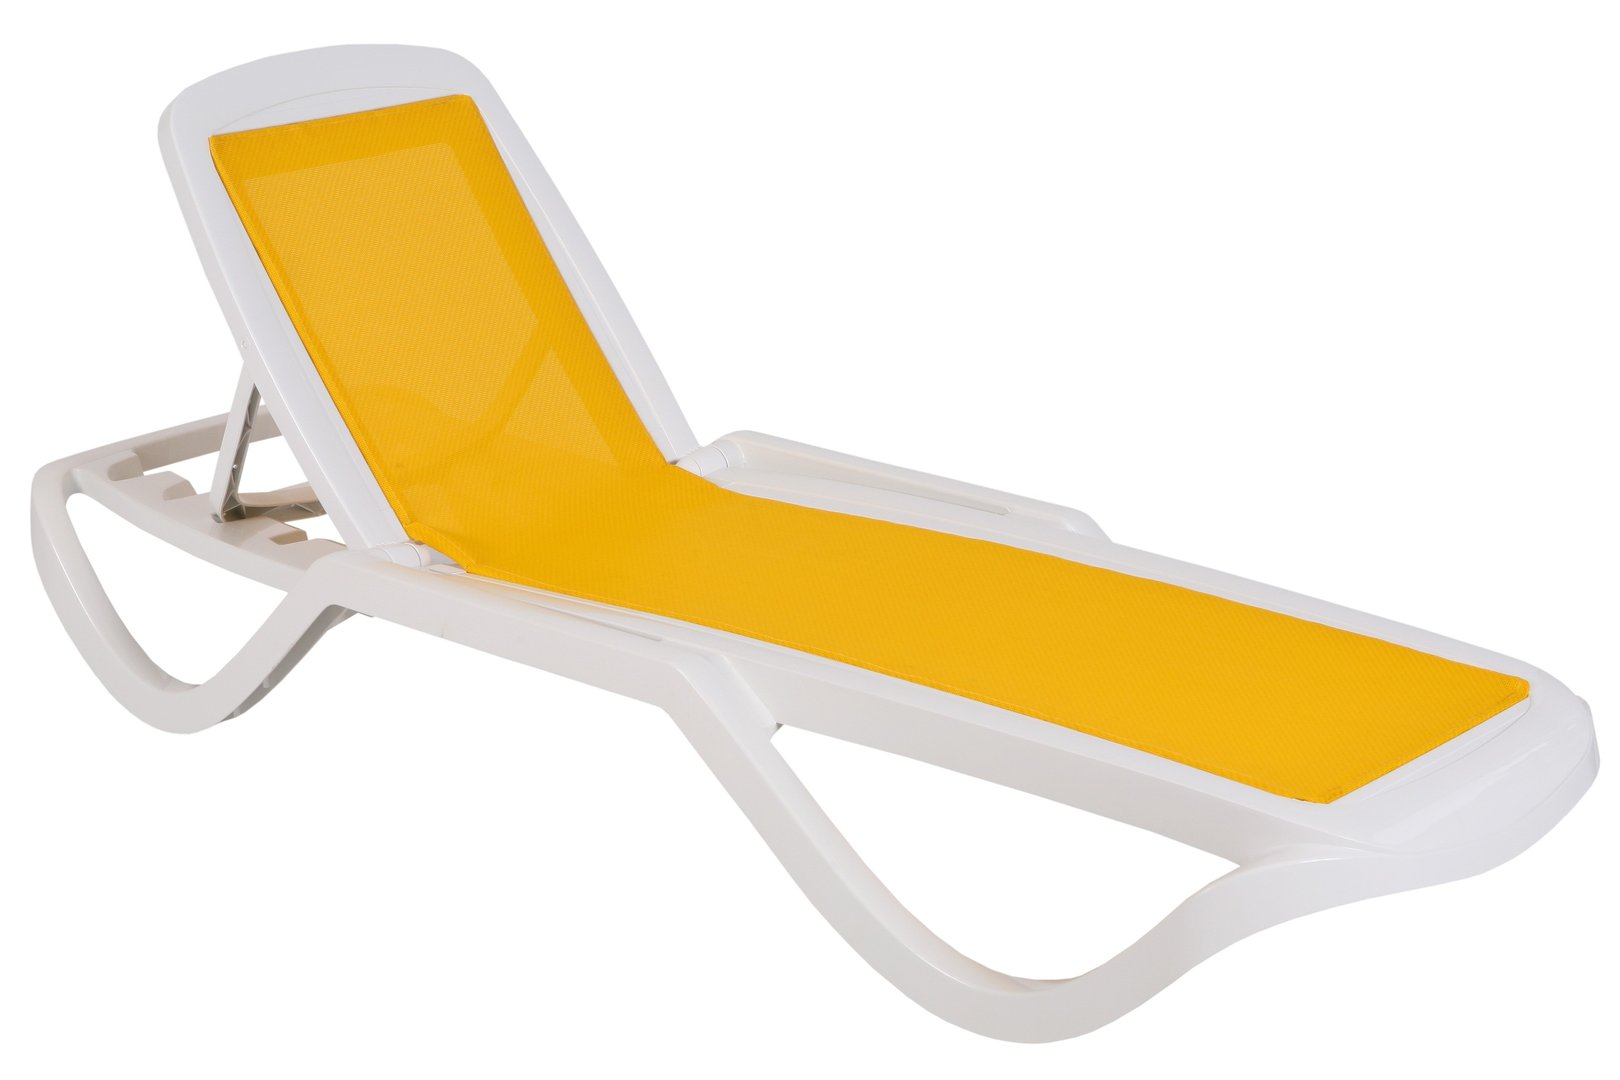 SSITG Mendler/ /Tumbona Piscina Tumbona Tumbona playa Tumbona silla de jard/ín